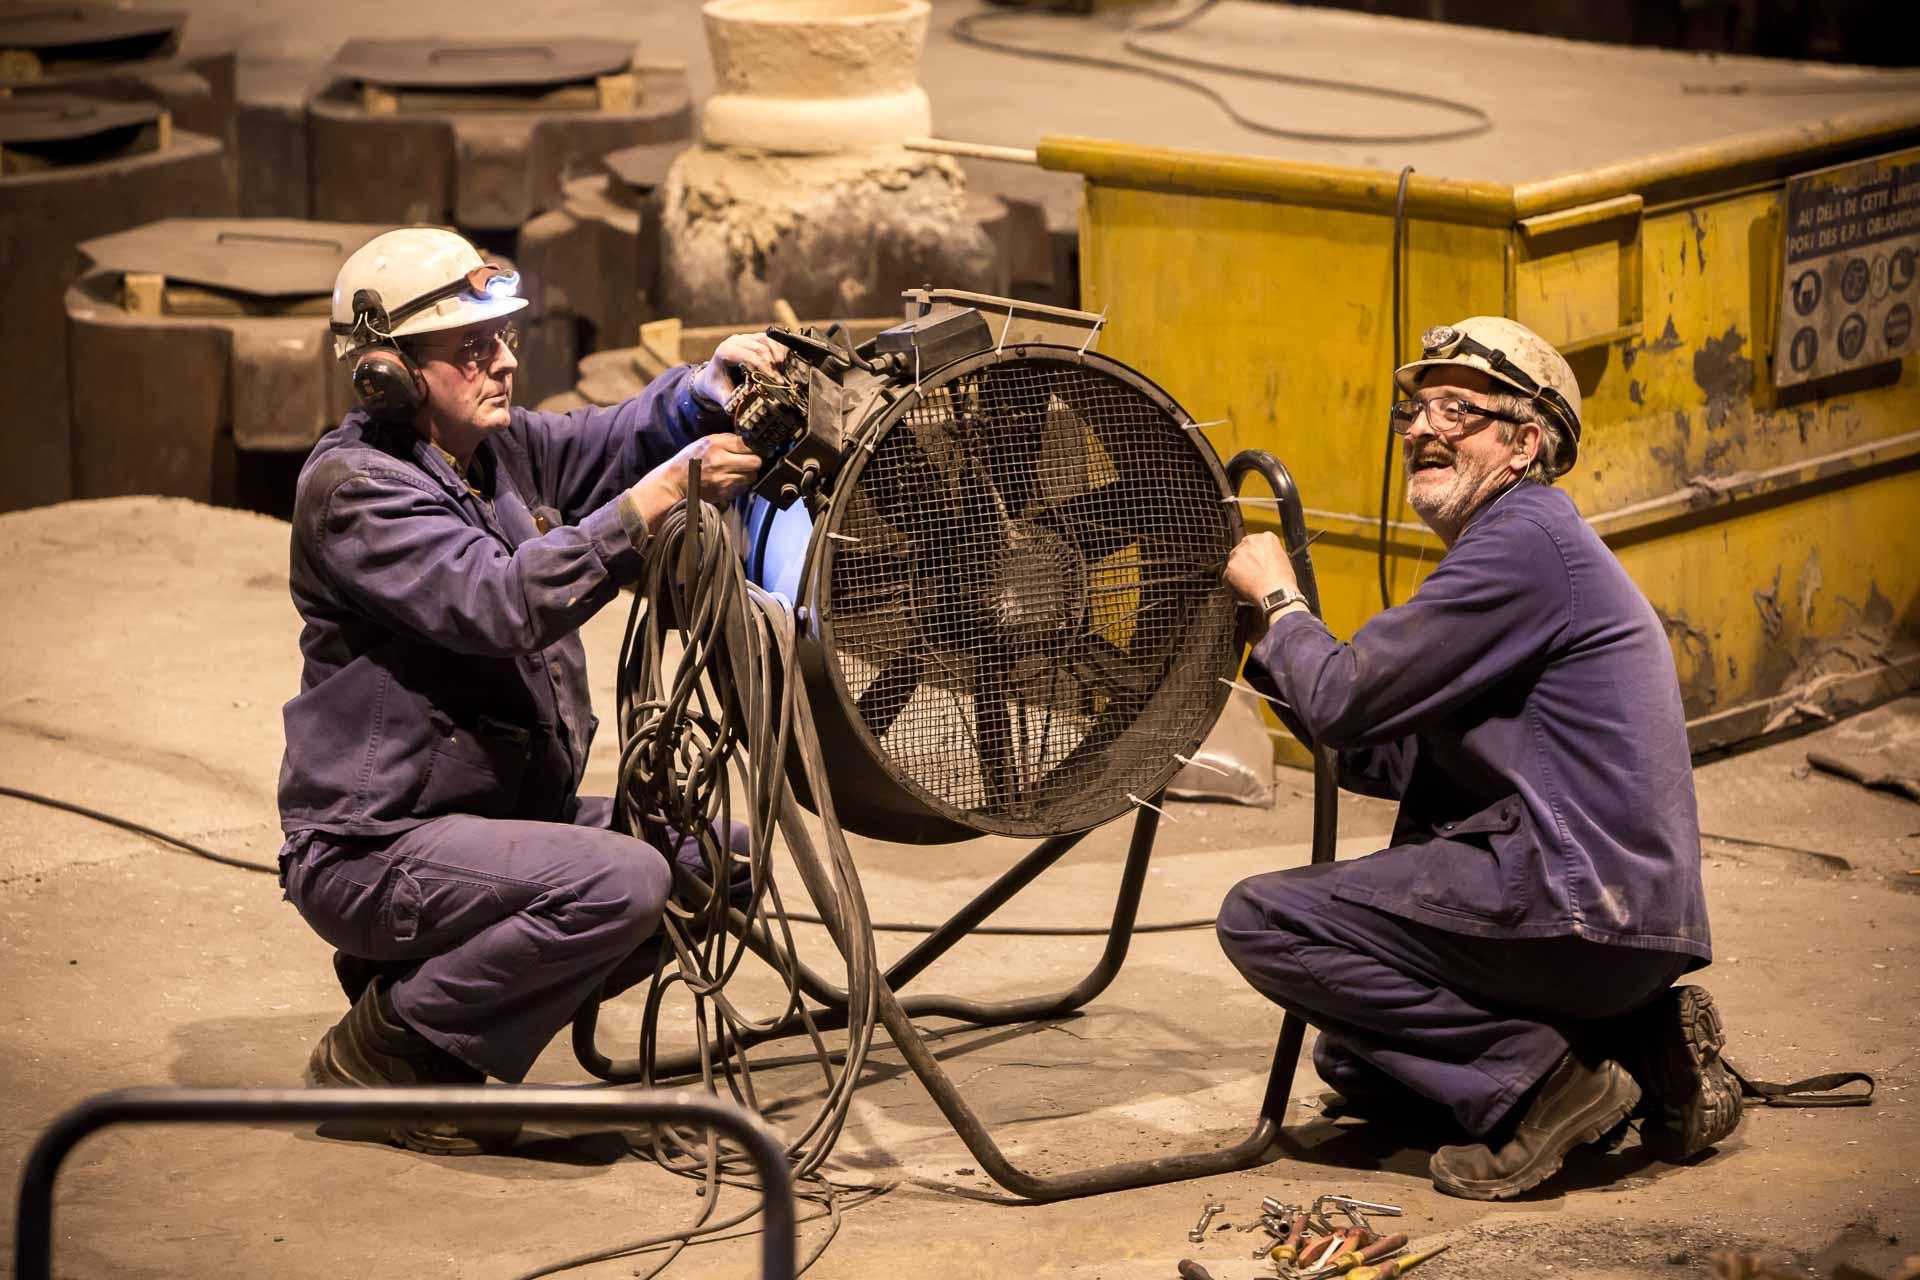 ascometal_juliencresp_reportage_industriel